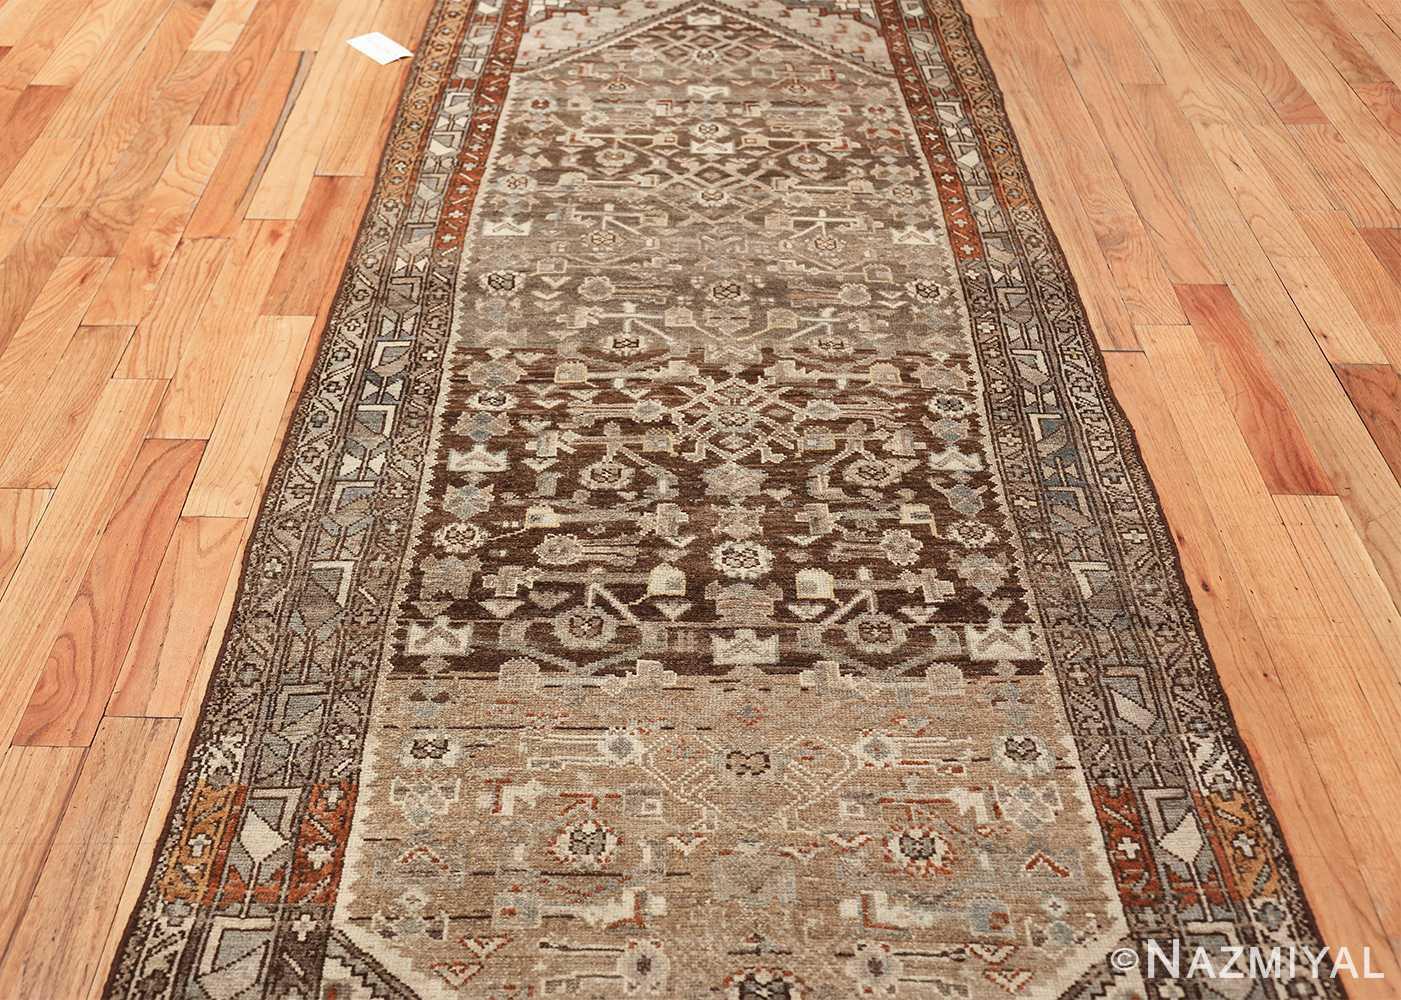 geometric designed antique tribal malayer persian runner rug 49629 field Nazmiyal